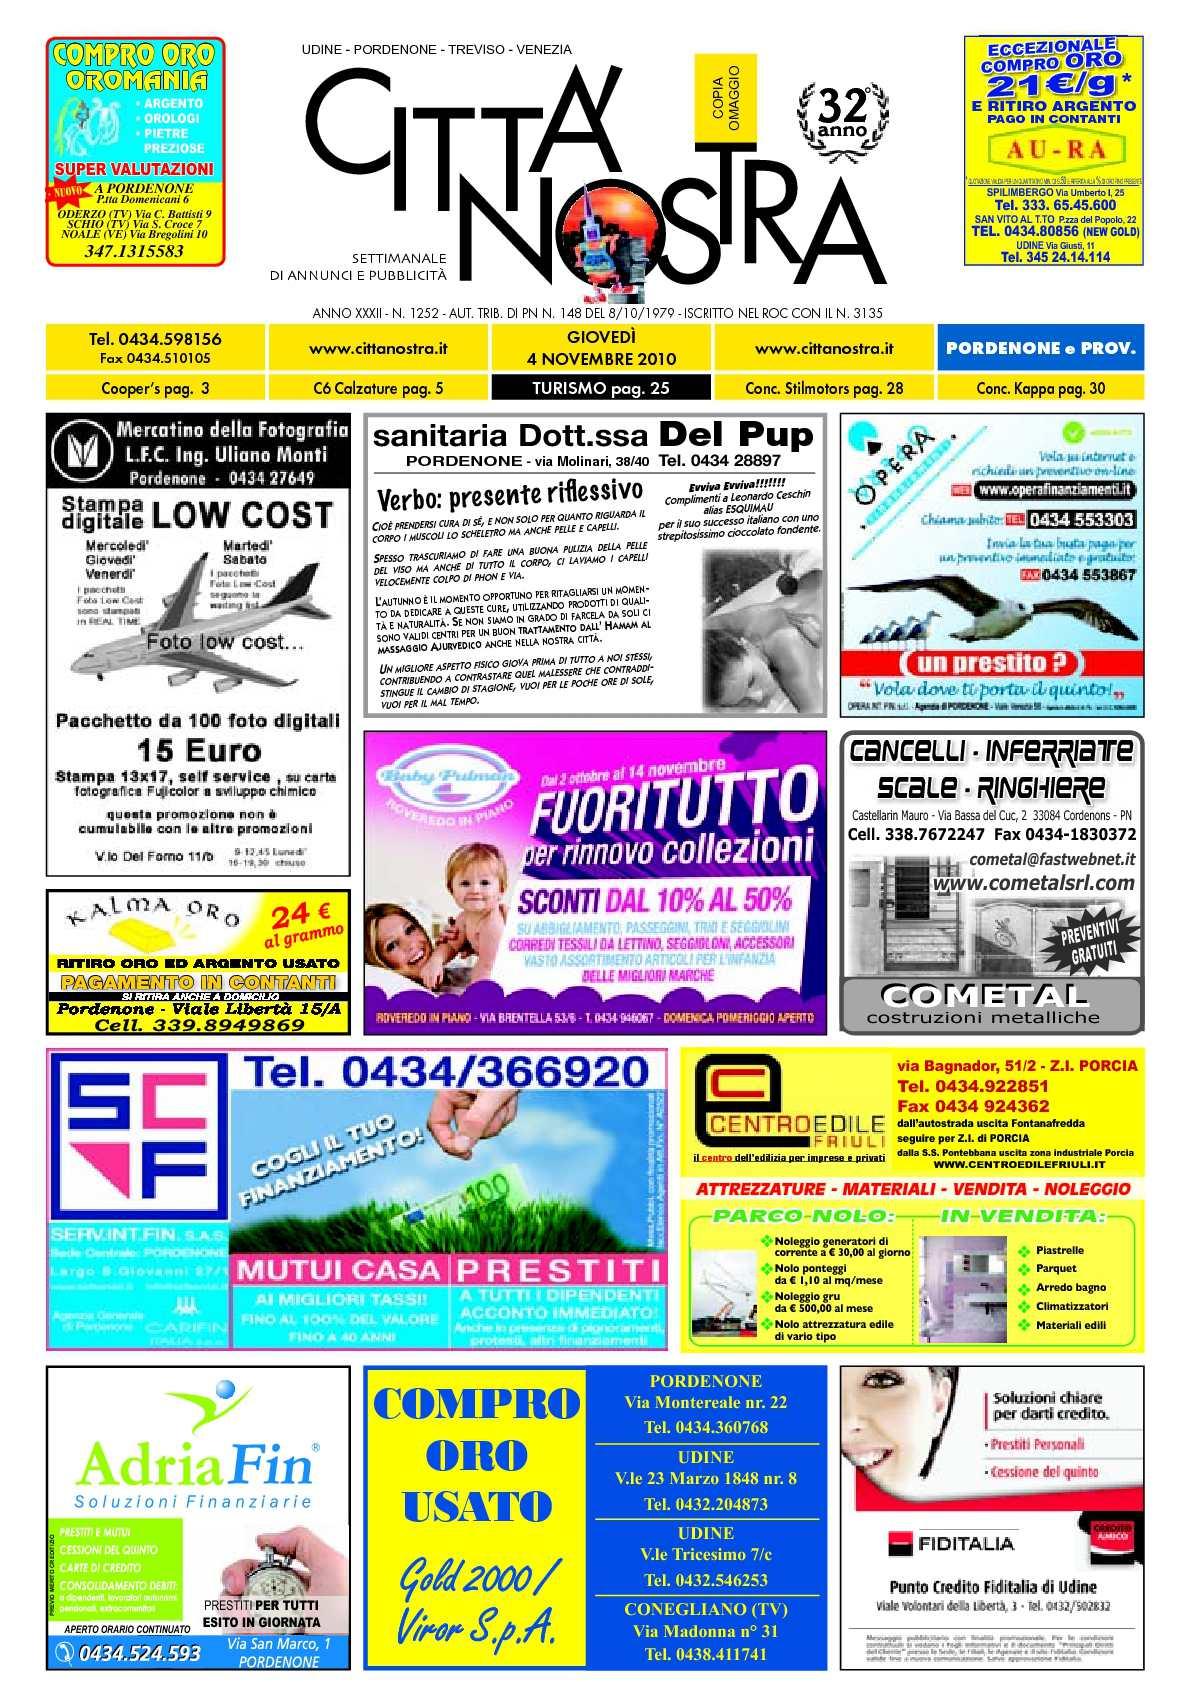 Calaméo - Città Nostra Pordenone del 04.11.2010 n. 1252 8c3524a149f